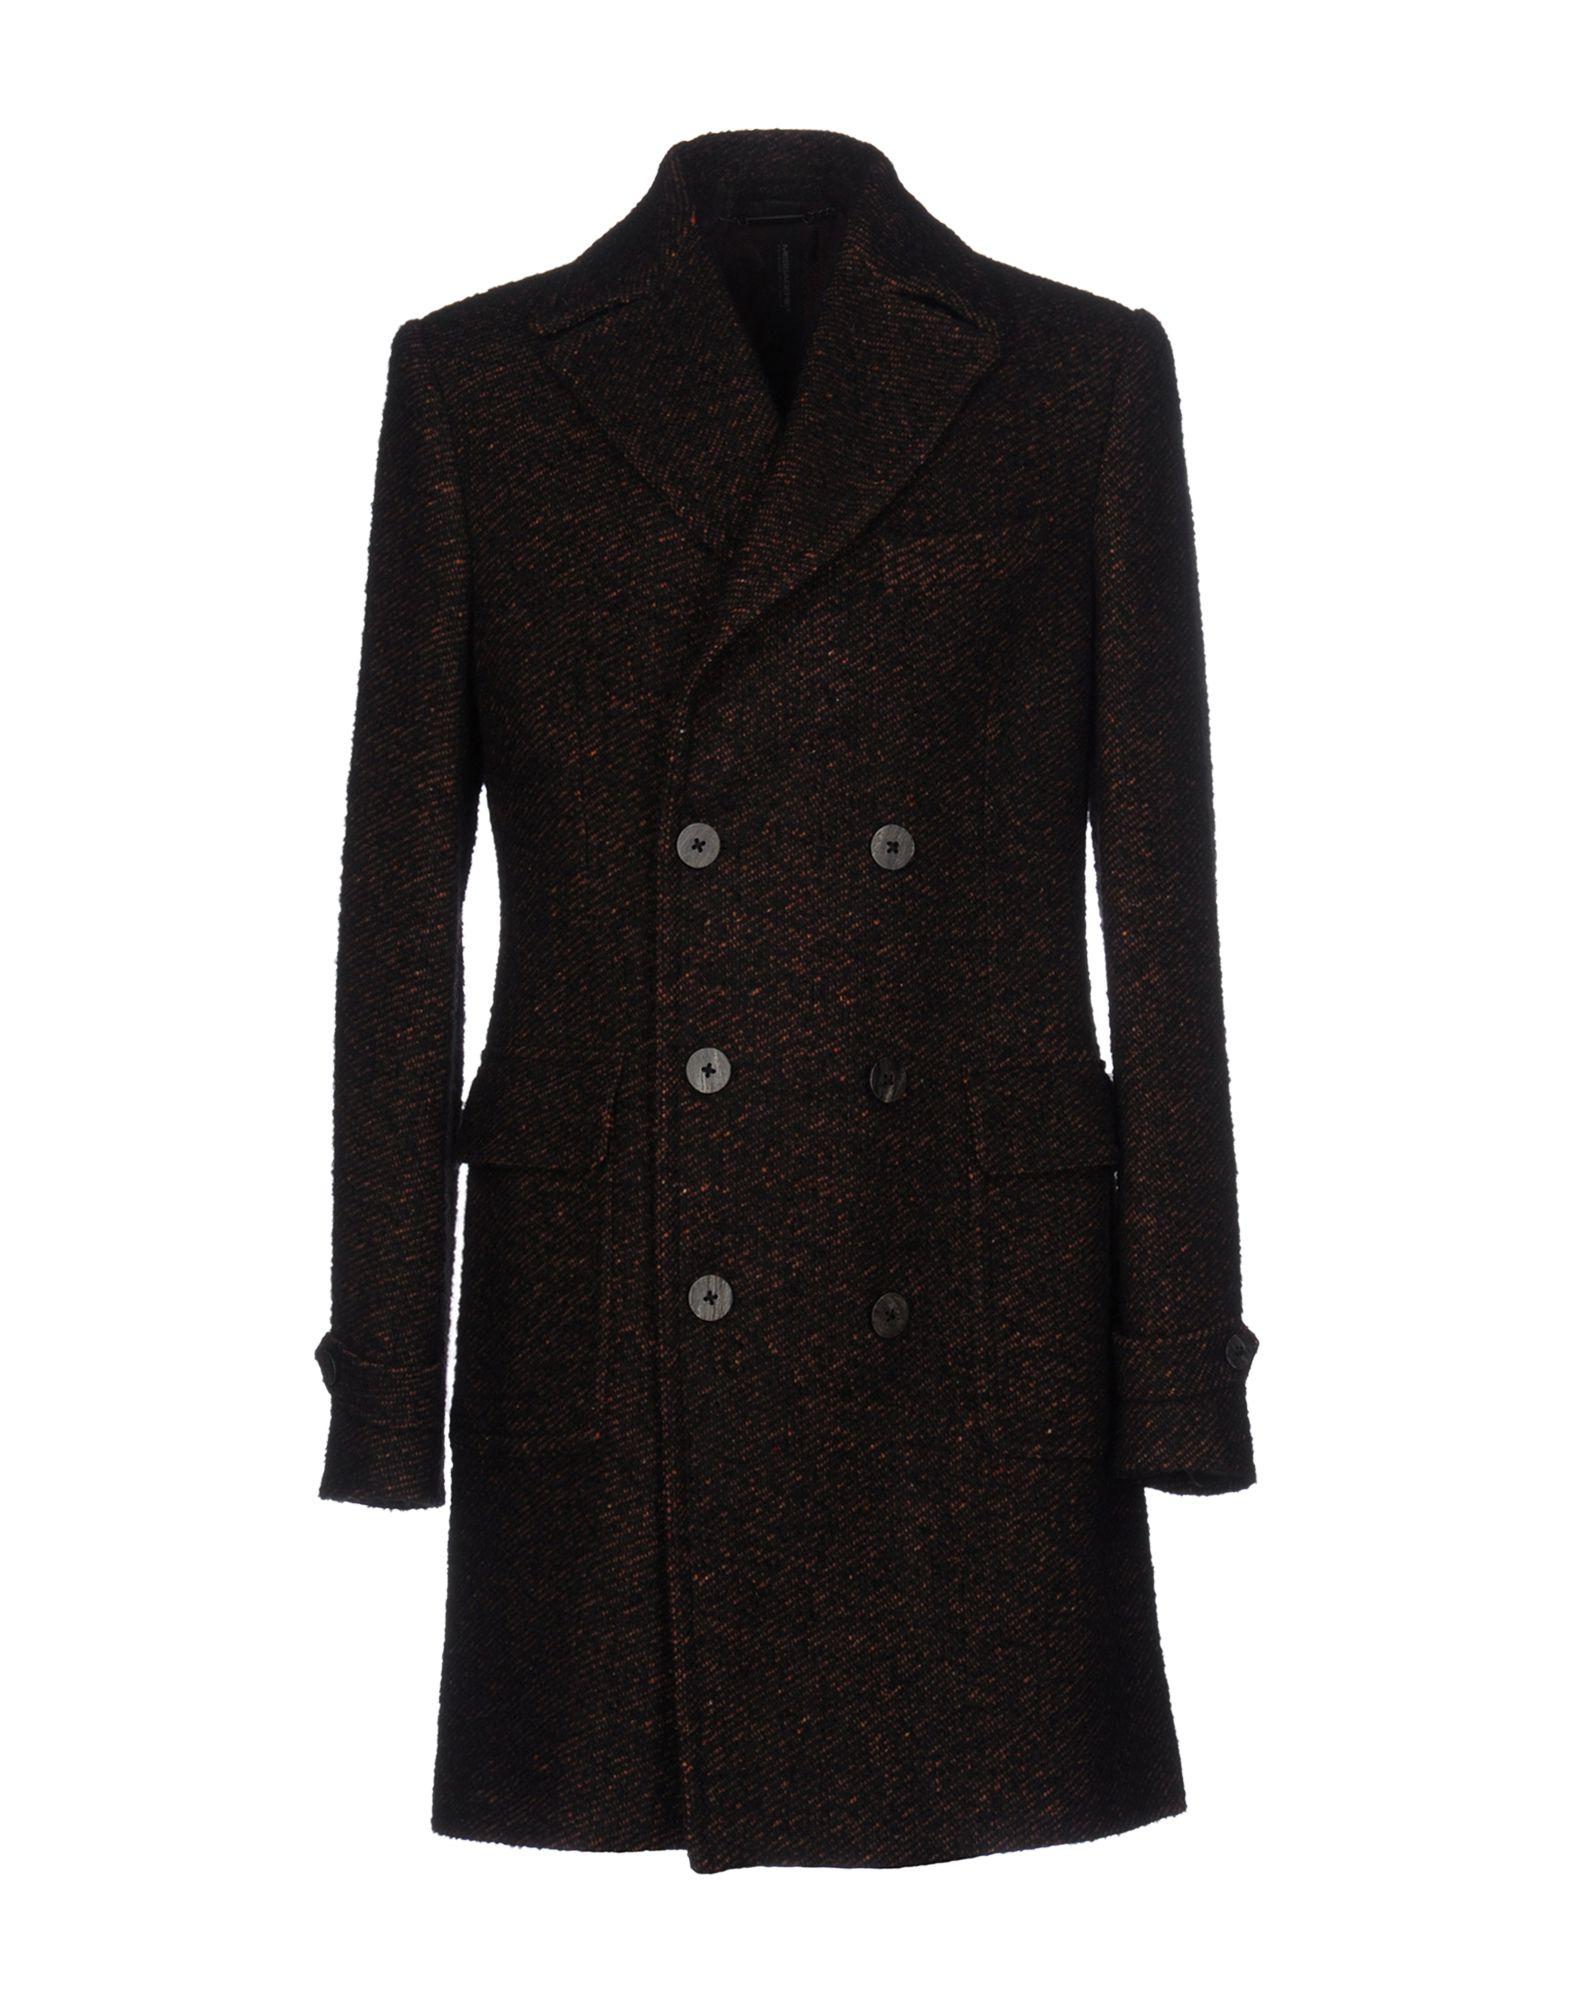 MESSAGERIE Herren Mantel Farbe Dunkelbraun Größe 5